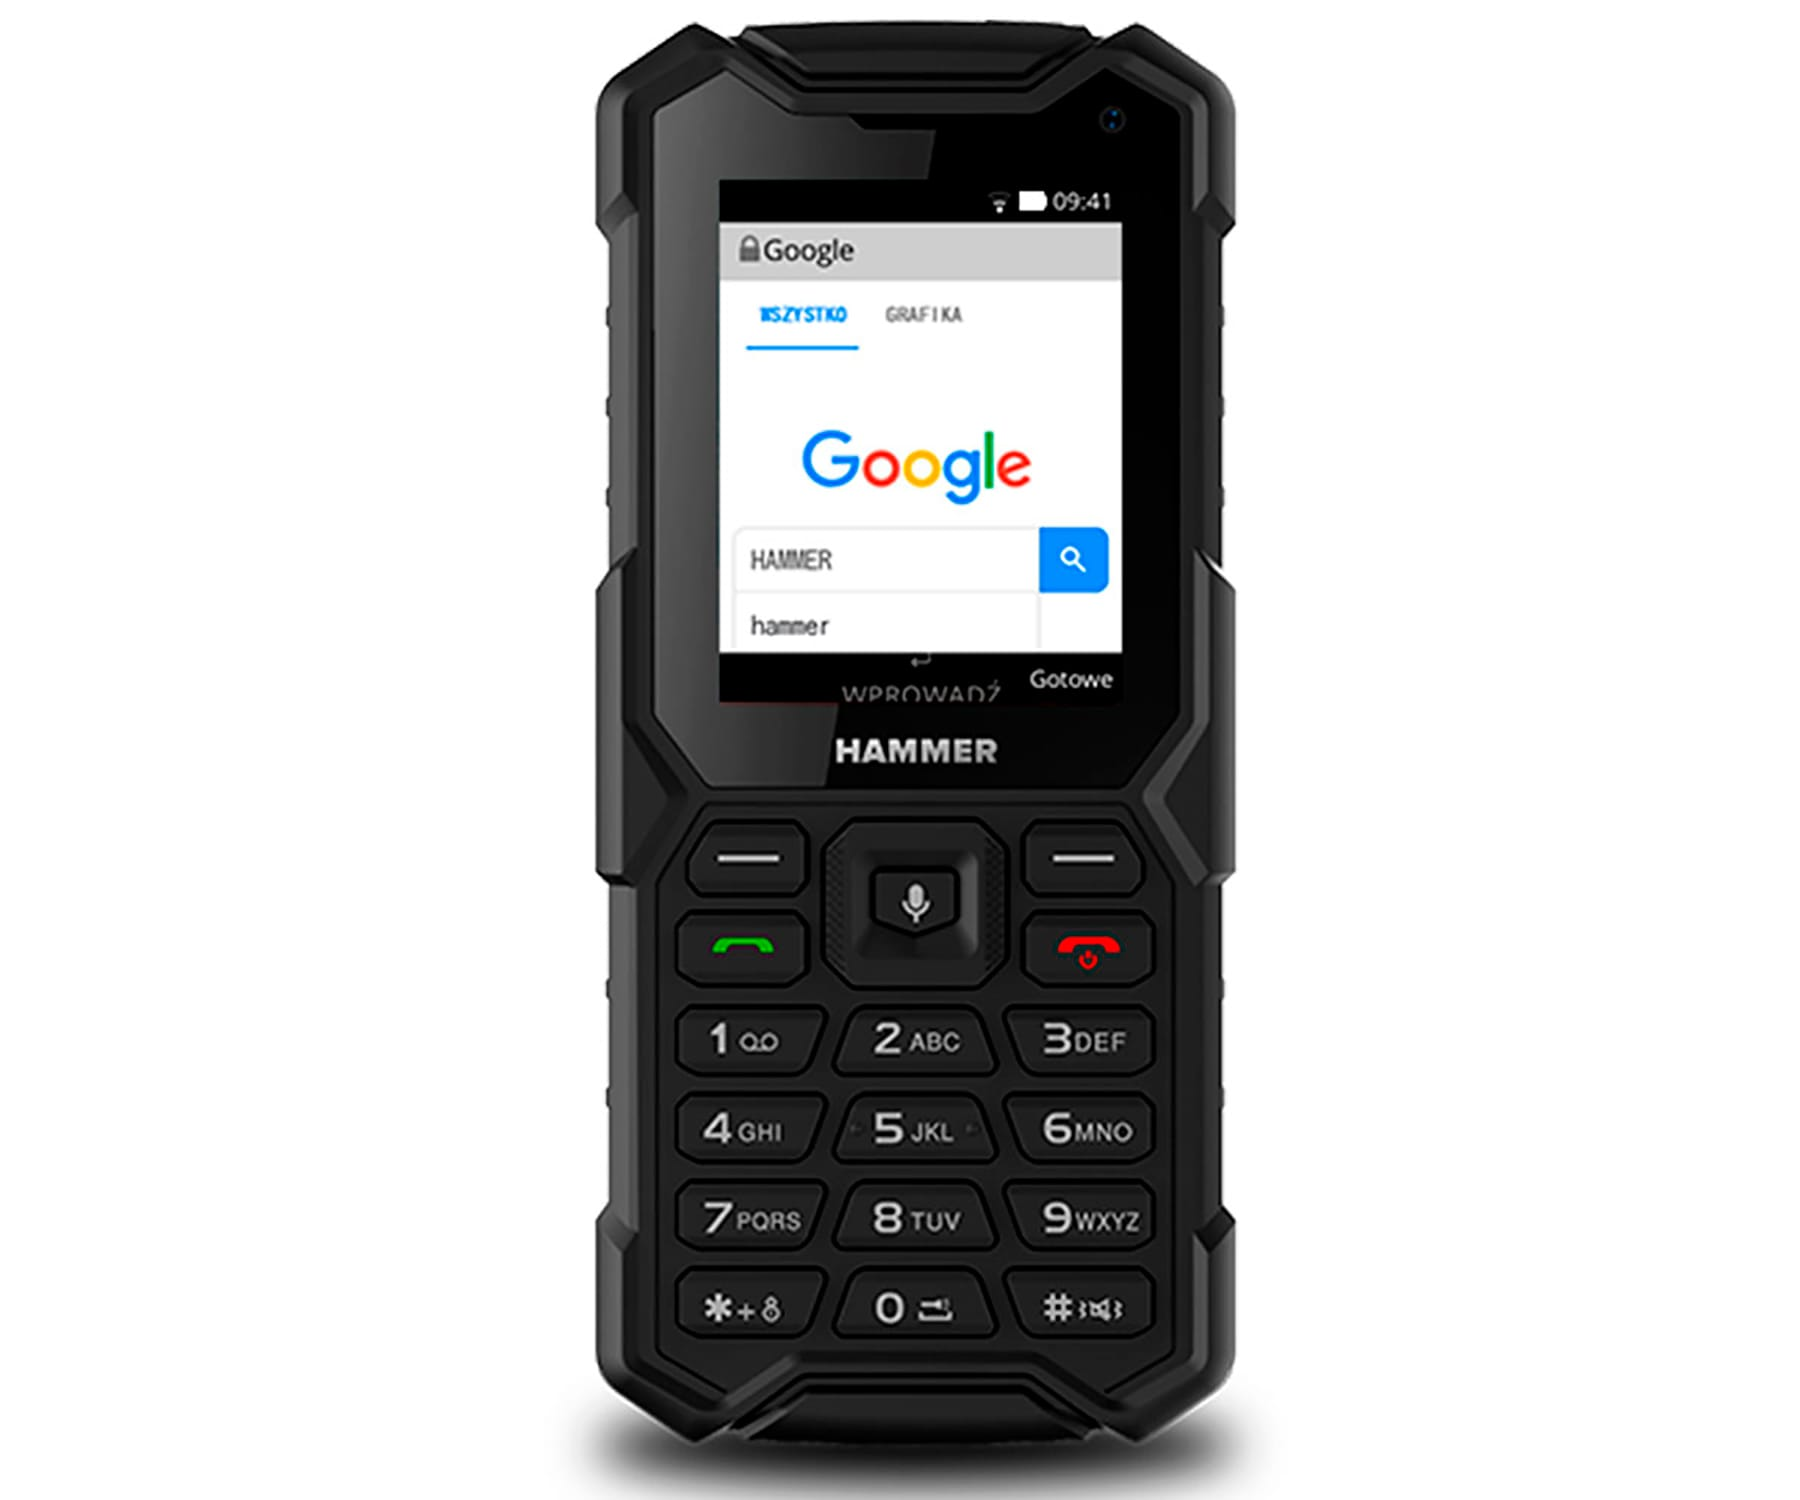 MYPHONE HAMMER 5 SMART NEGRO MÓVIL 4G RESISTENTE IP68 DUAL SIM 2.4'' TFT CÁMARA BLUETOOTH RADIO FM